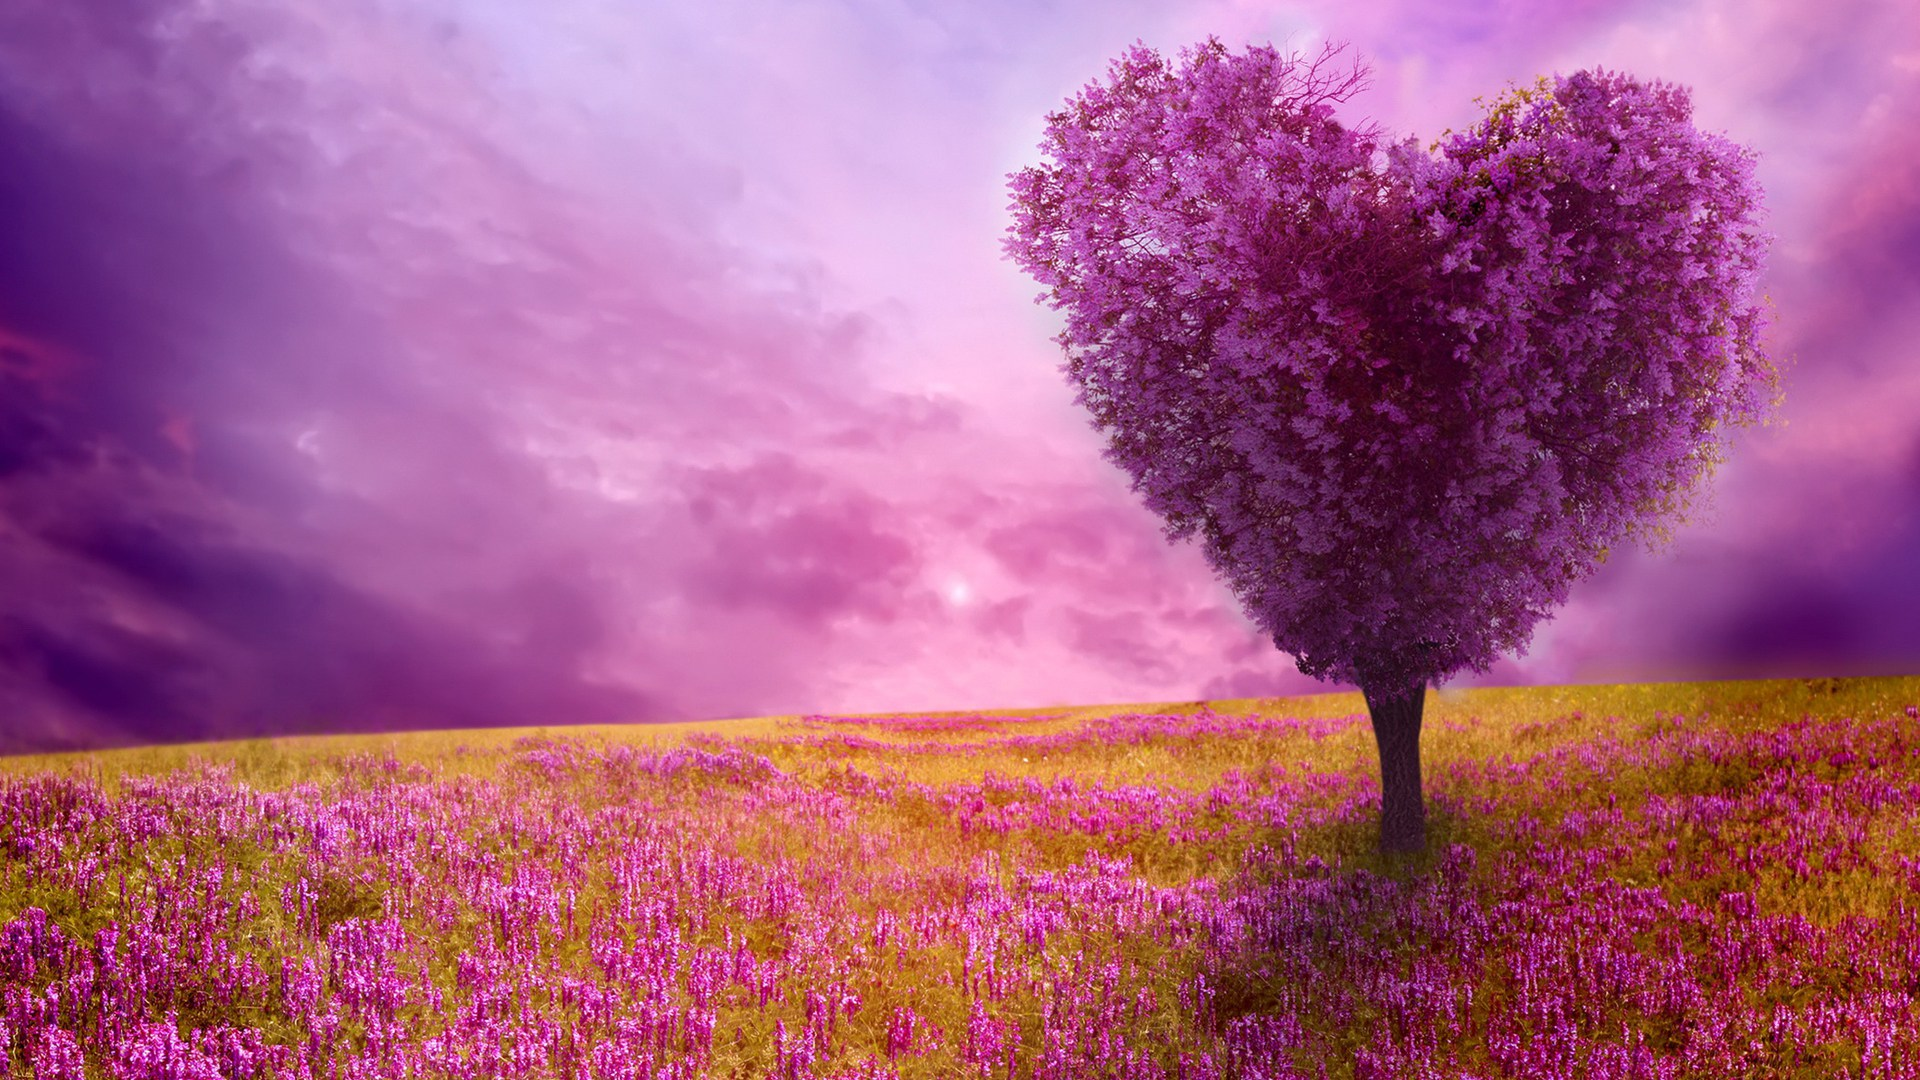 Top 10 HD Spring Season Desktop BackgroundsWallpapers 1920x1080